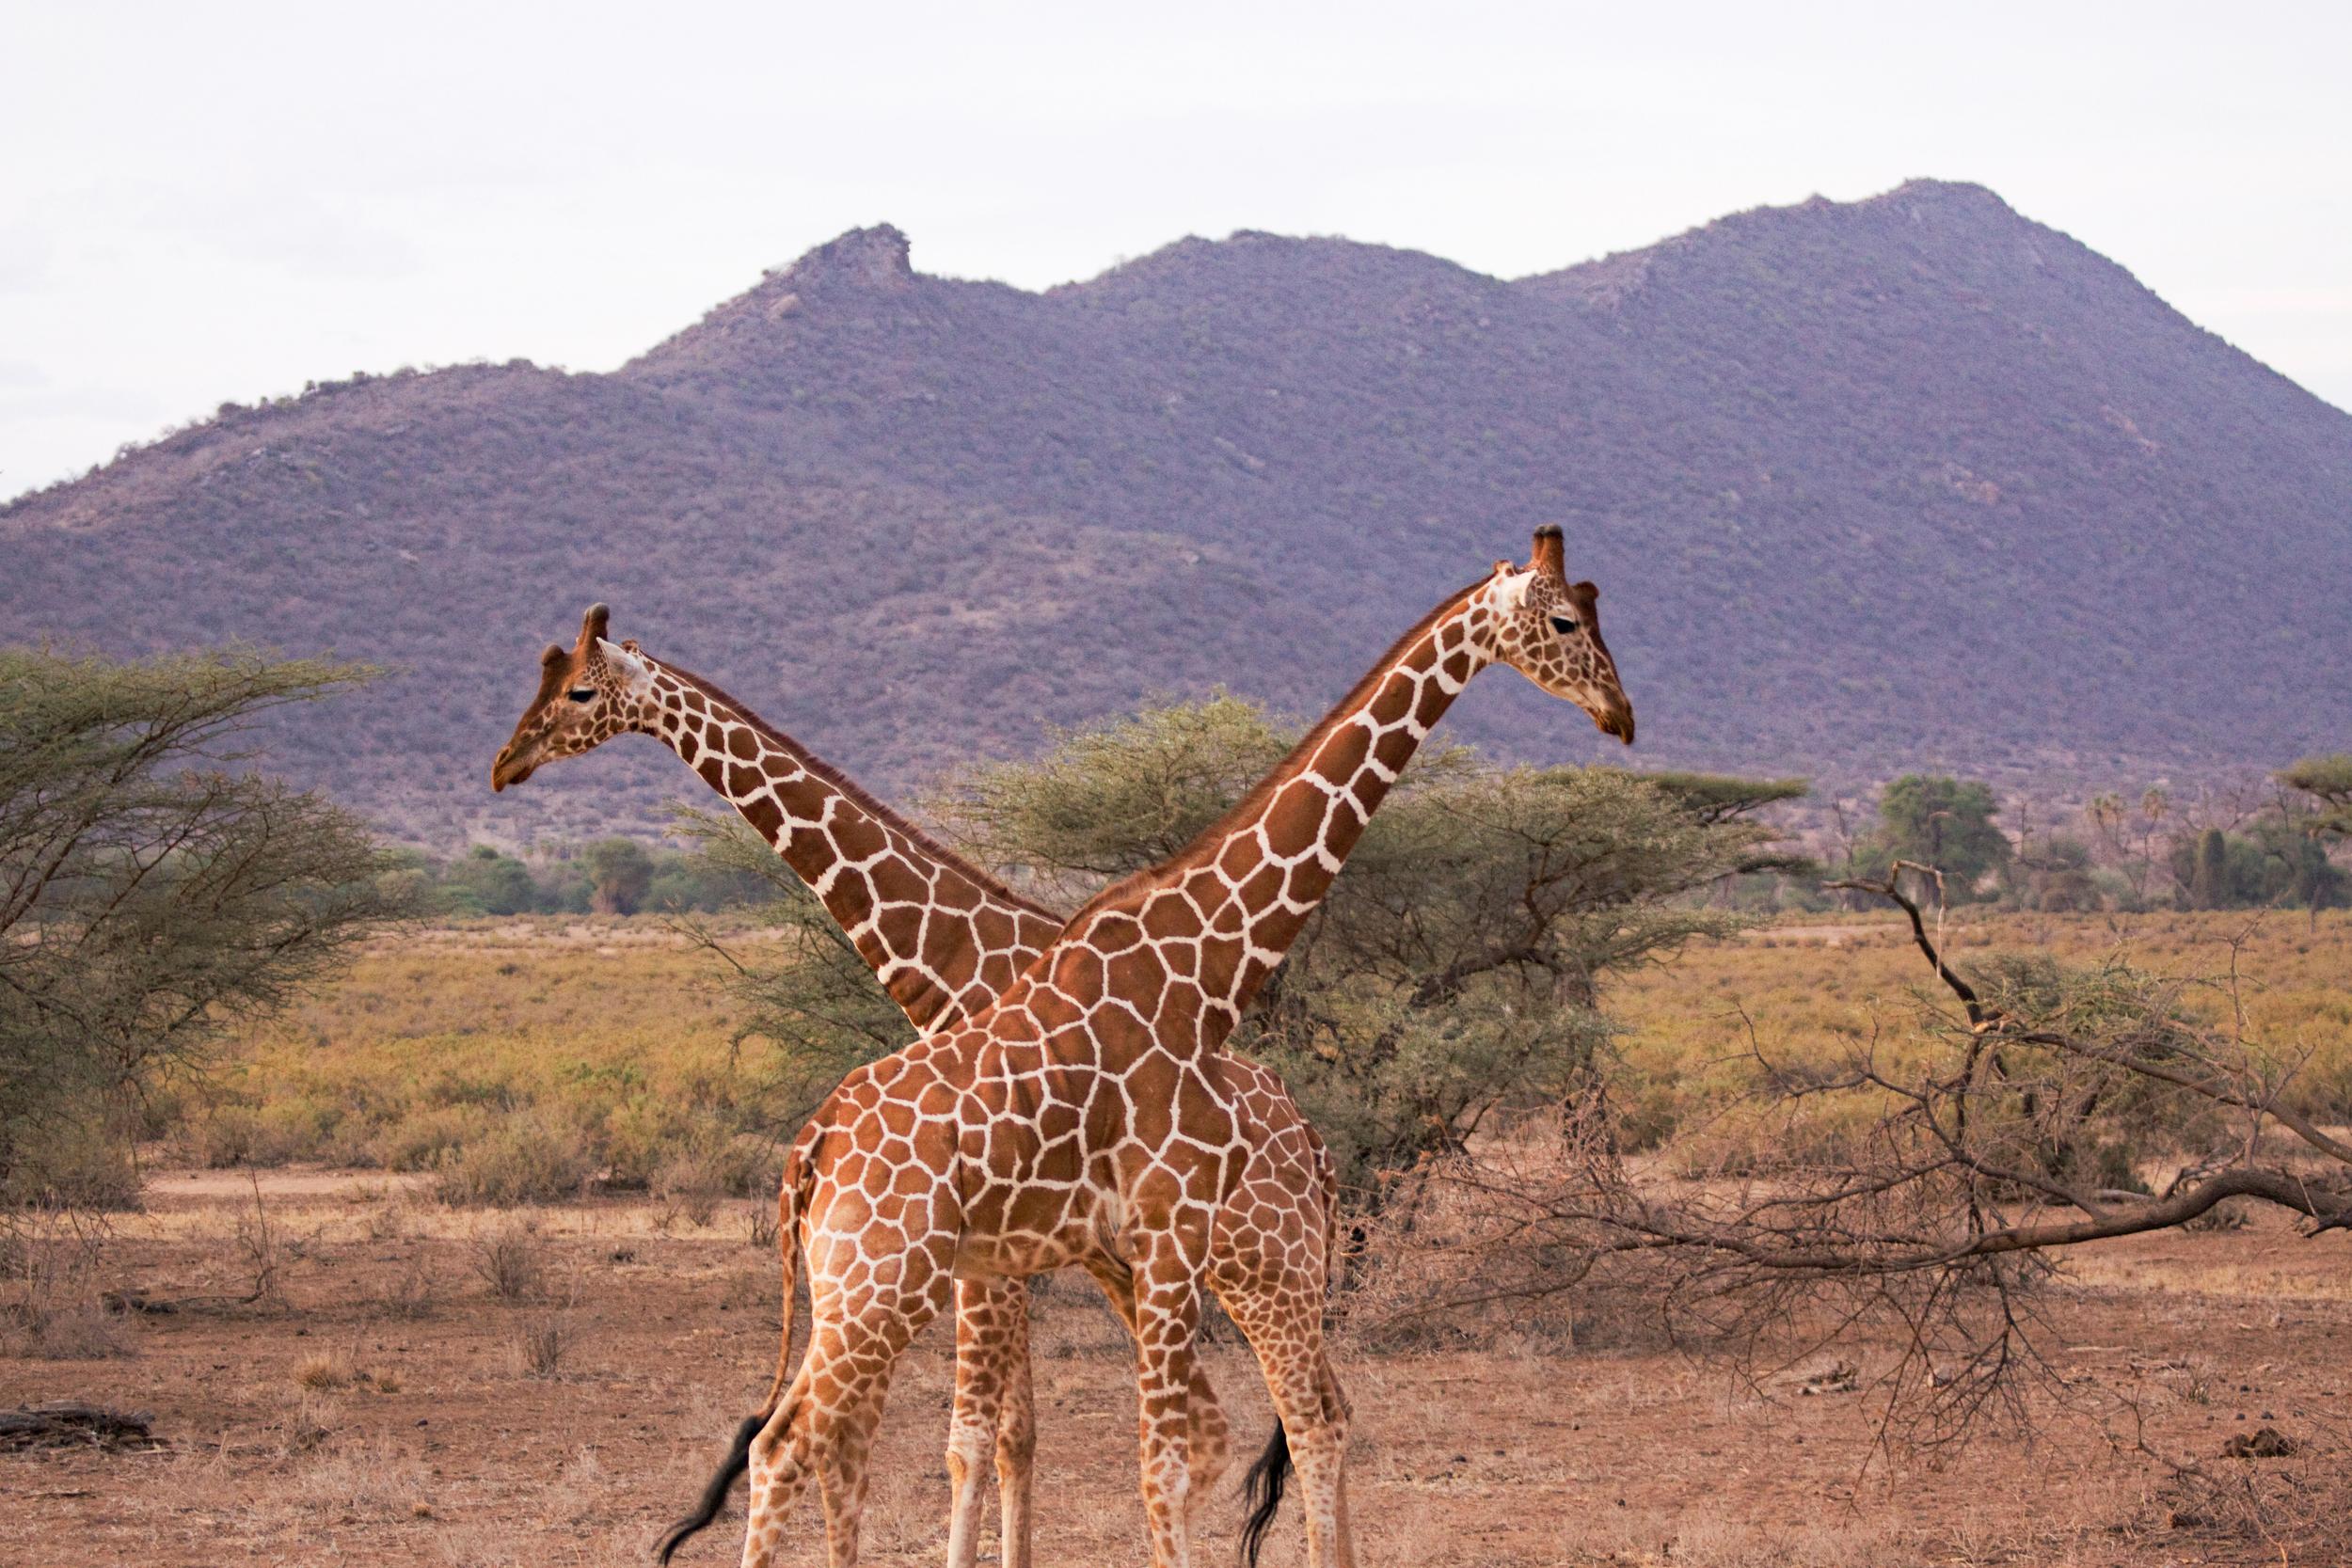 Reticulated Giraffes, Samburu National Park